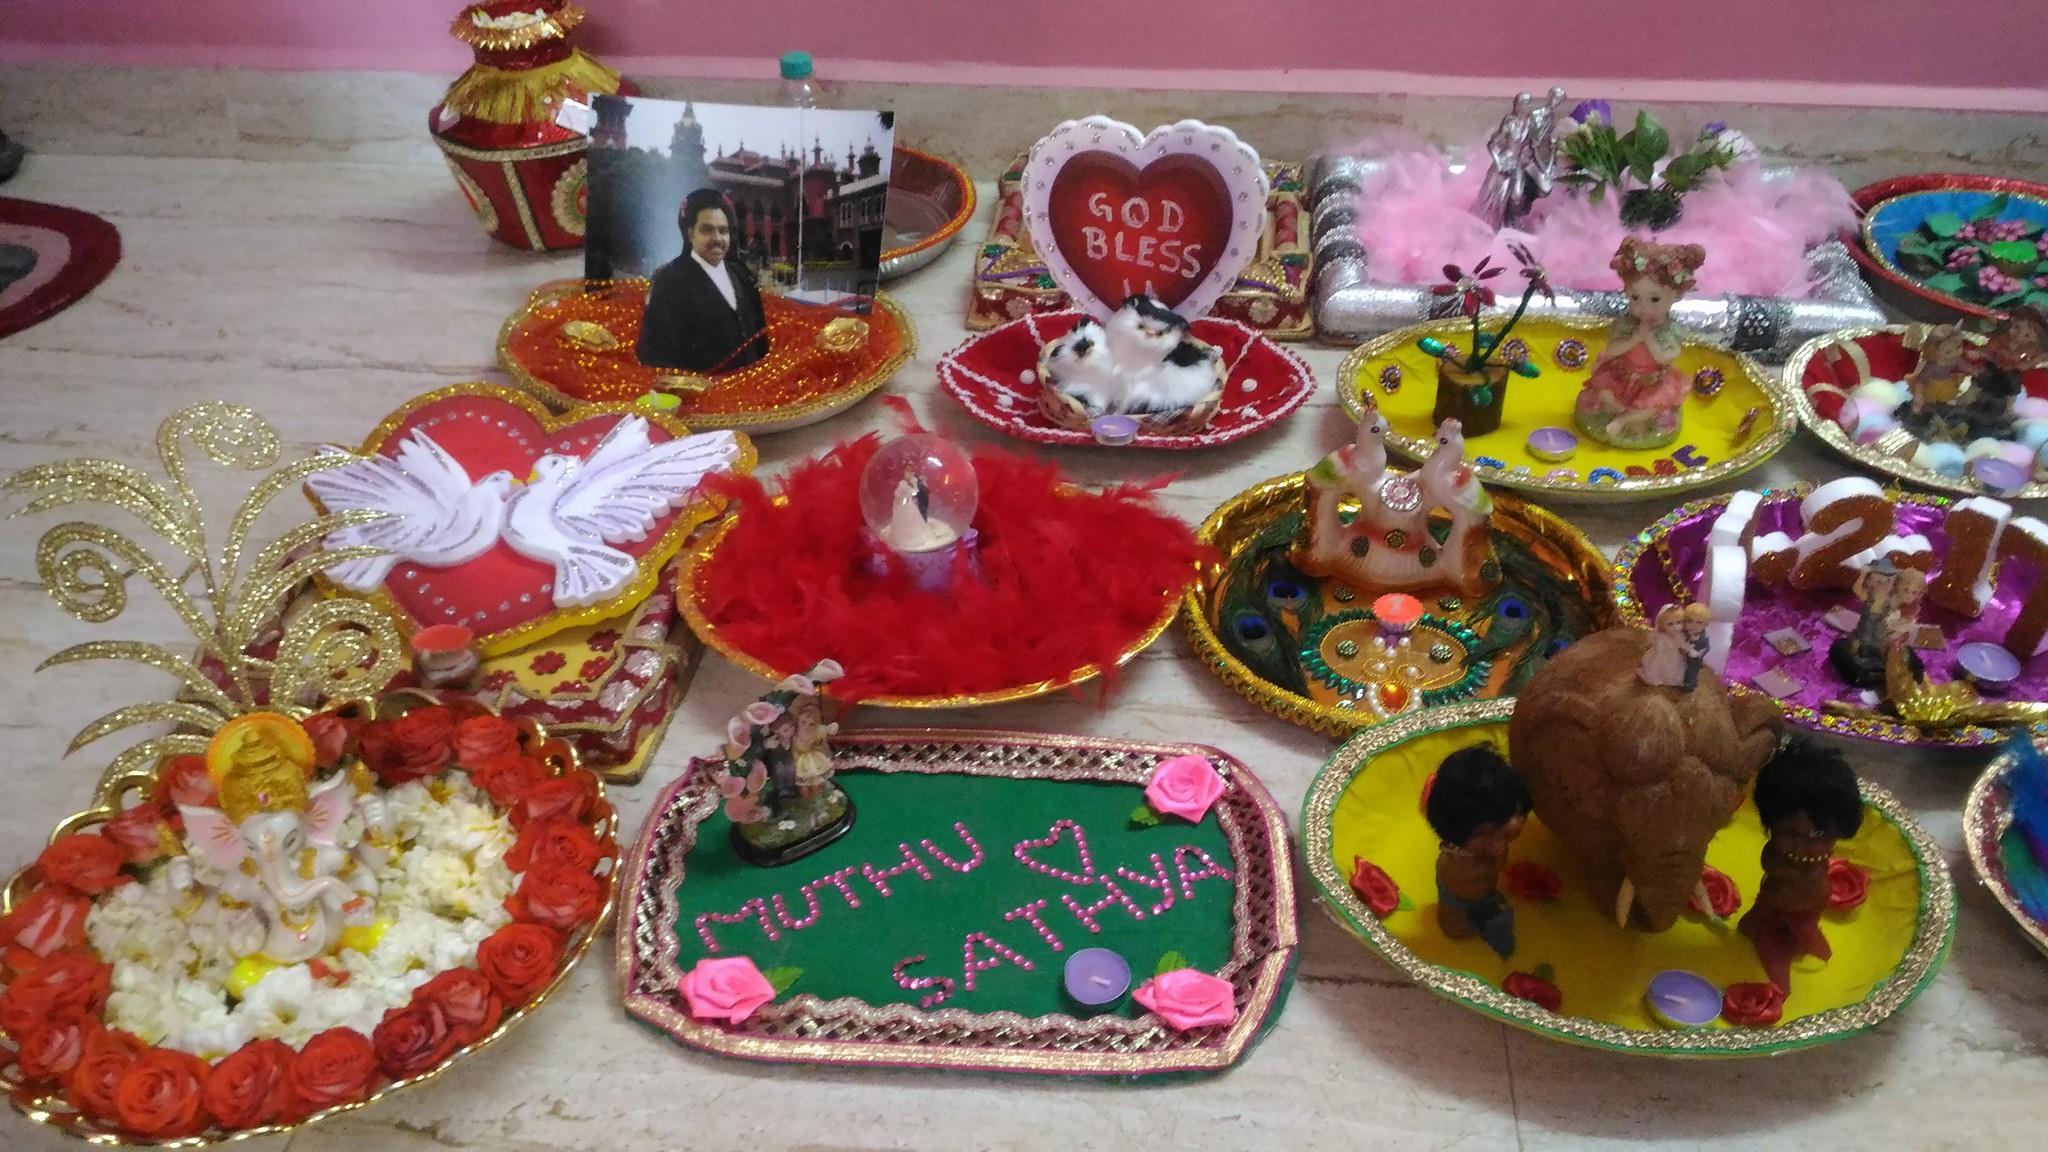 Wedding Return Gift Shops In Chennai: Chandra's Wedding, Aarthi Plates & Return Gifts